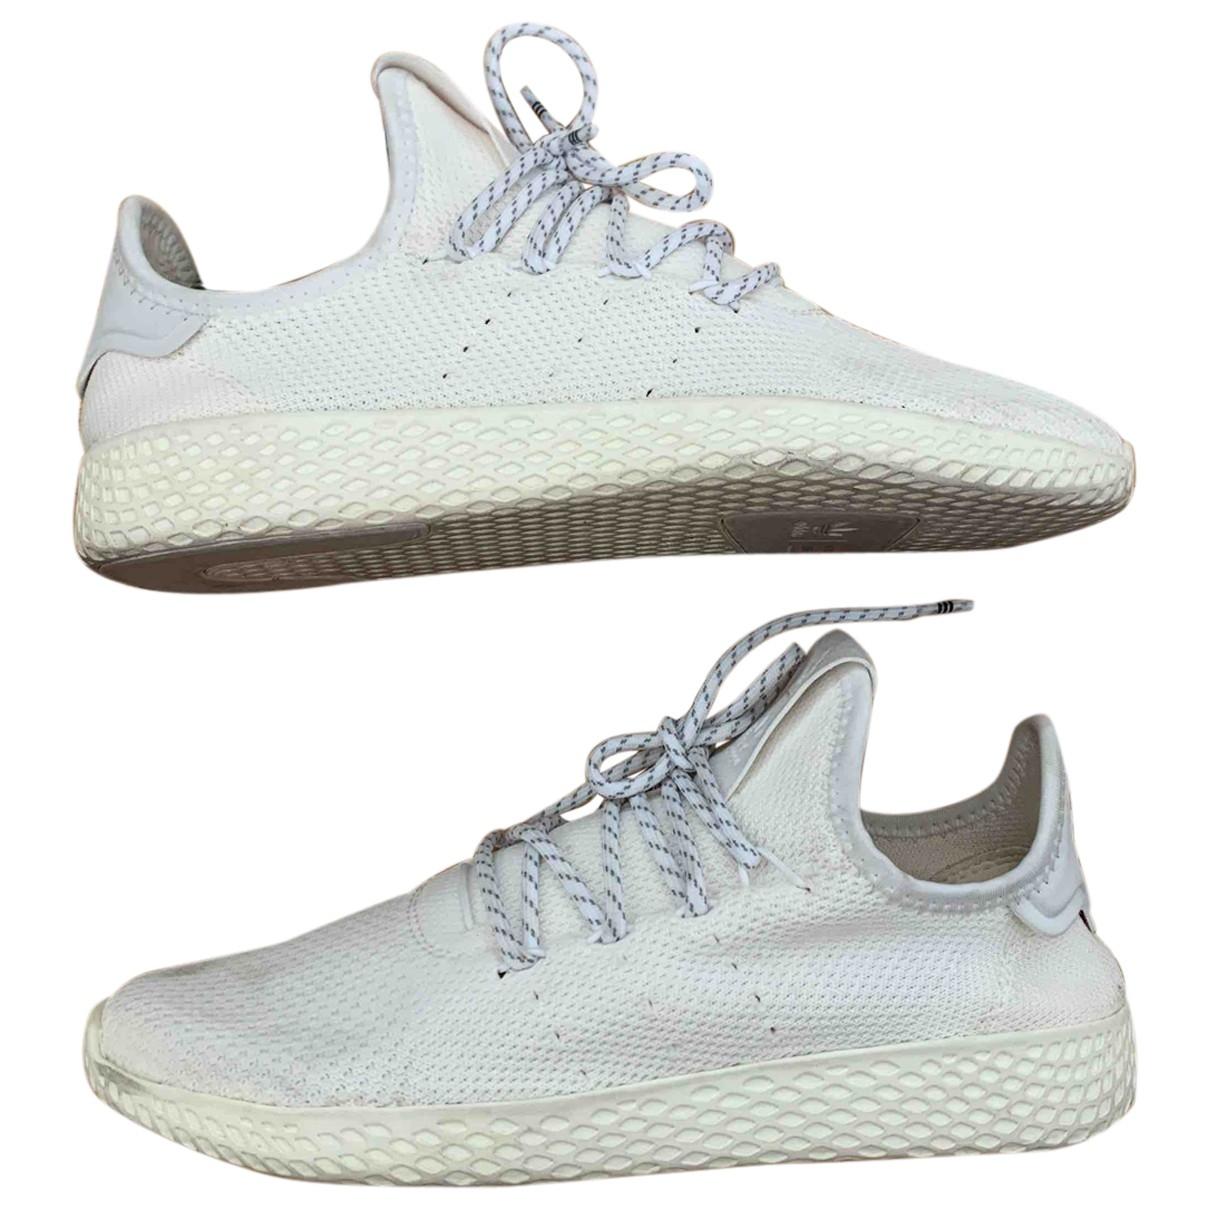 Adidas X Pharrell Williams NMD Hu Sneakers in  Weiss Leinen